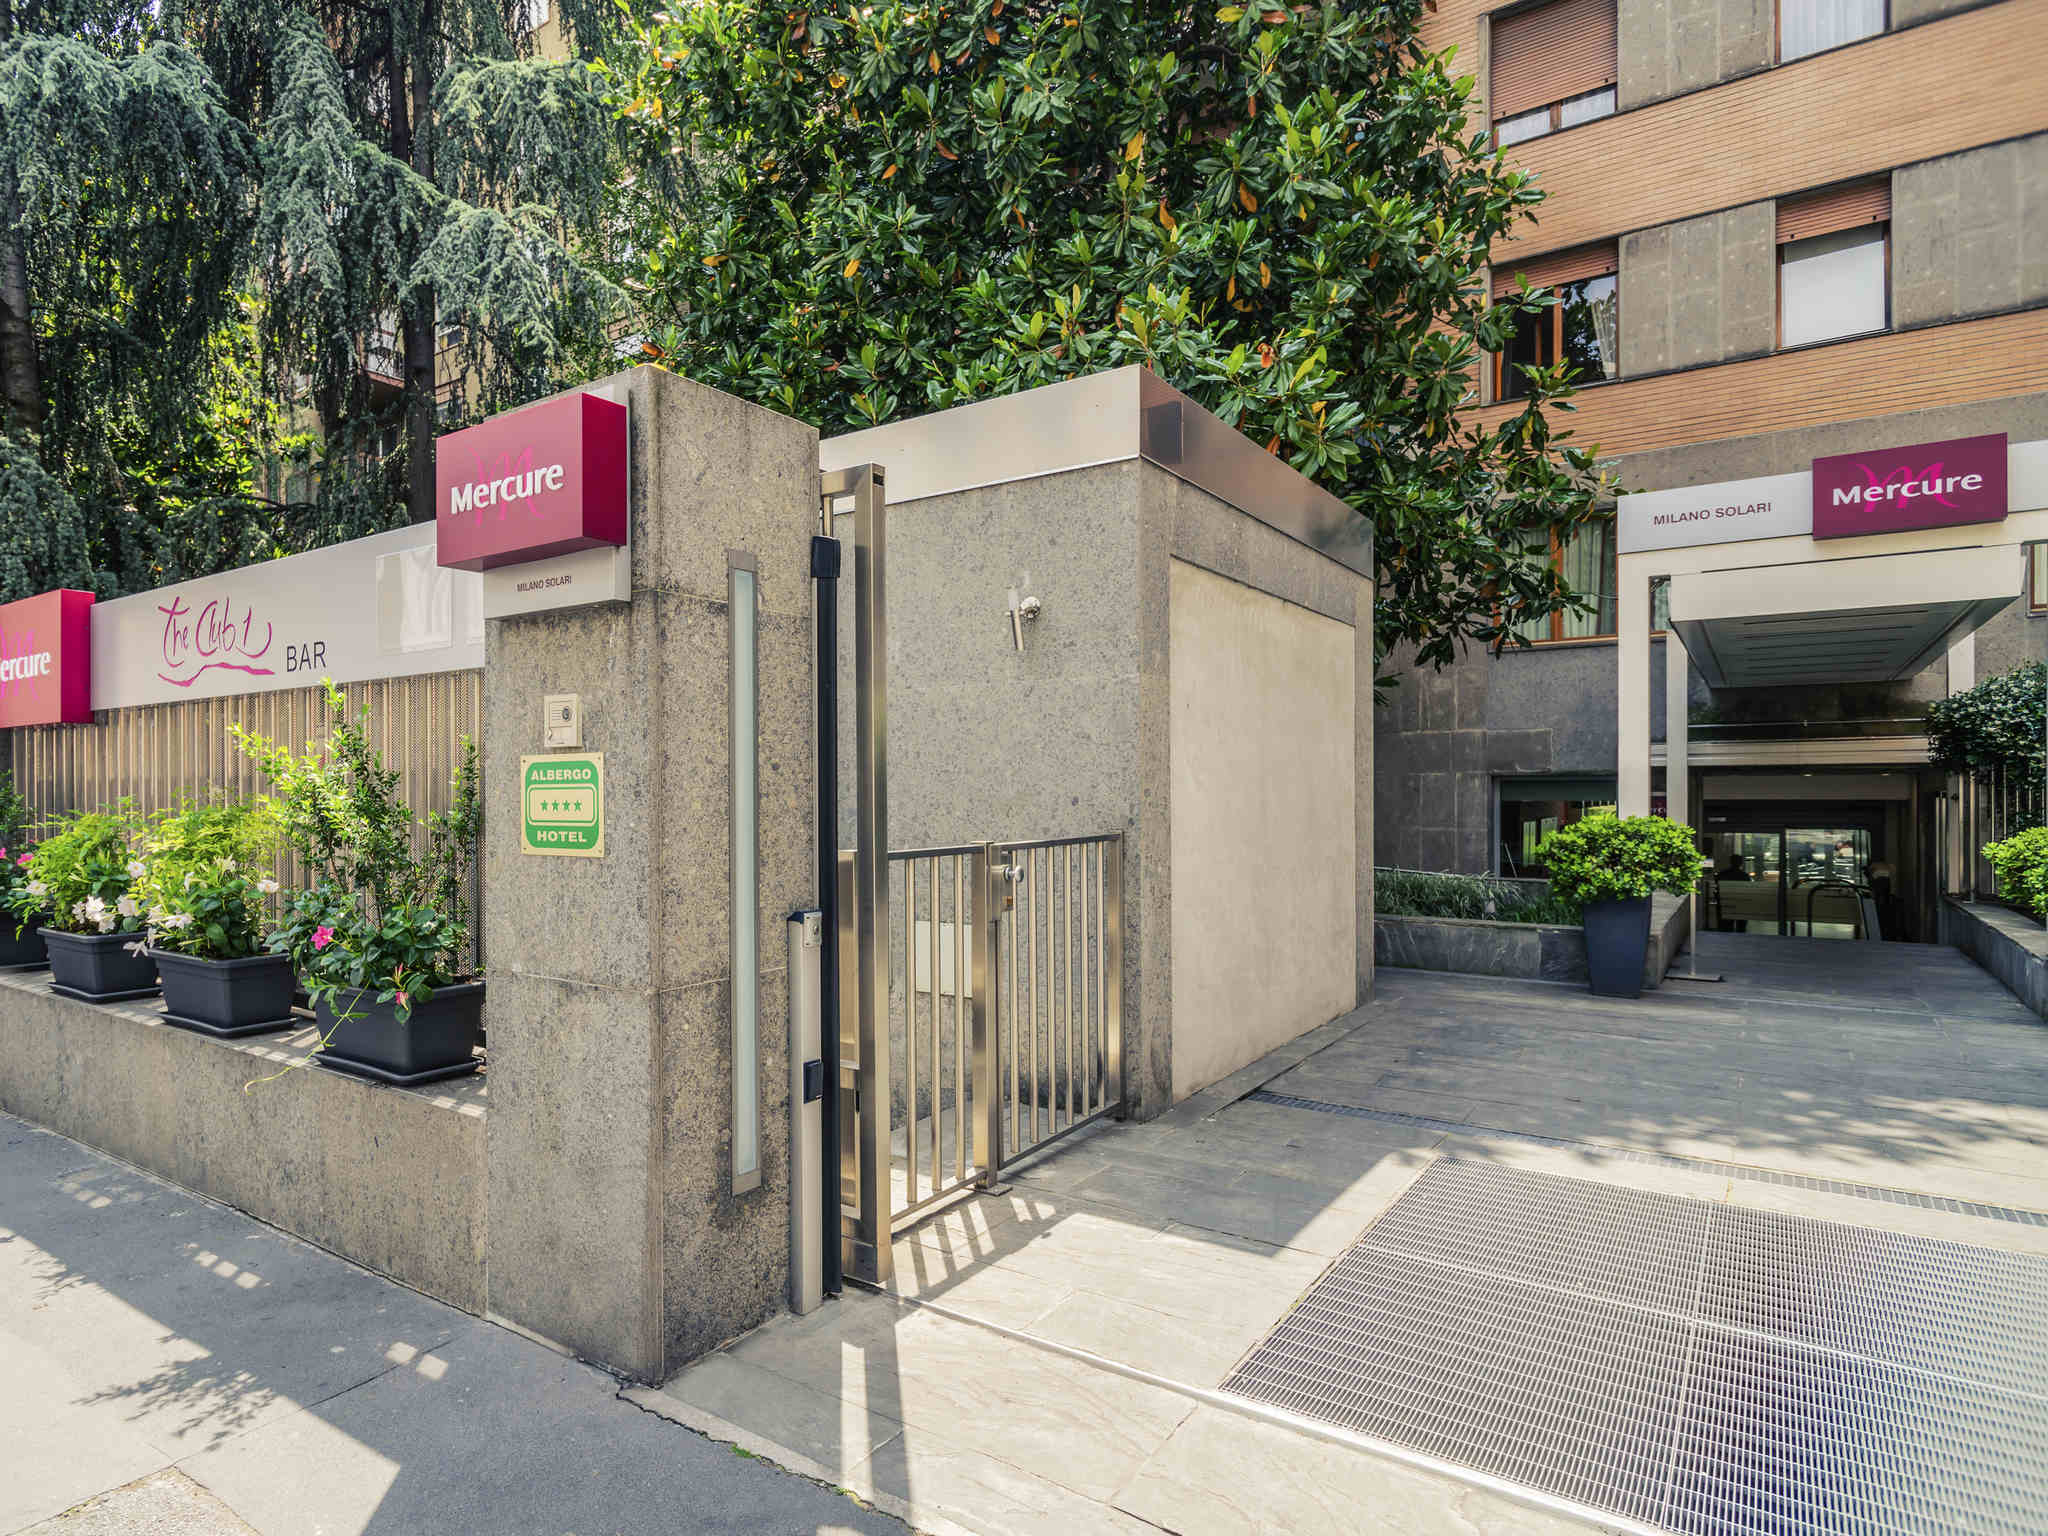 Hotel – Mercure Milano Solari